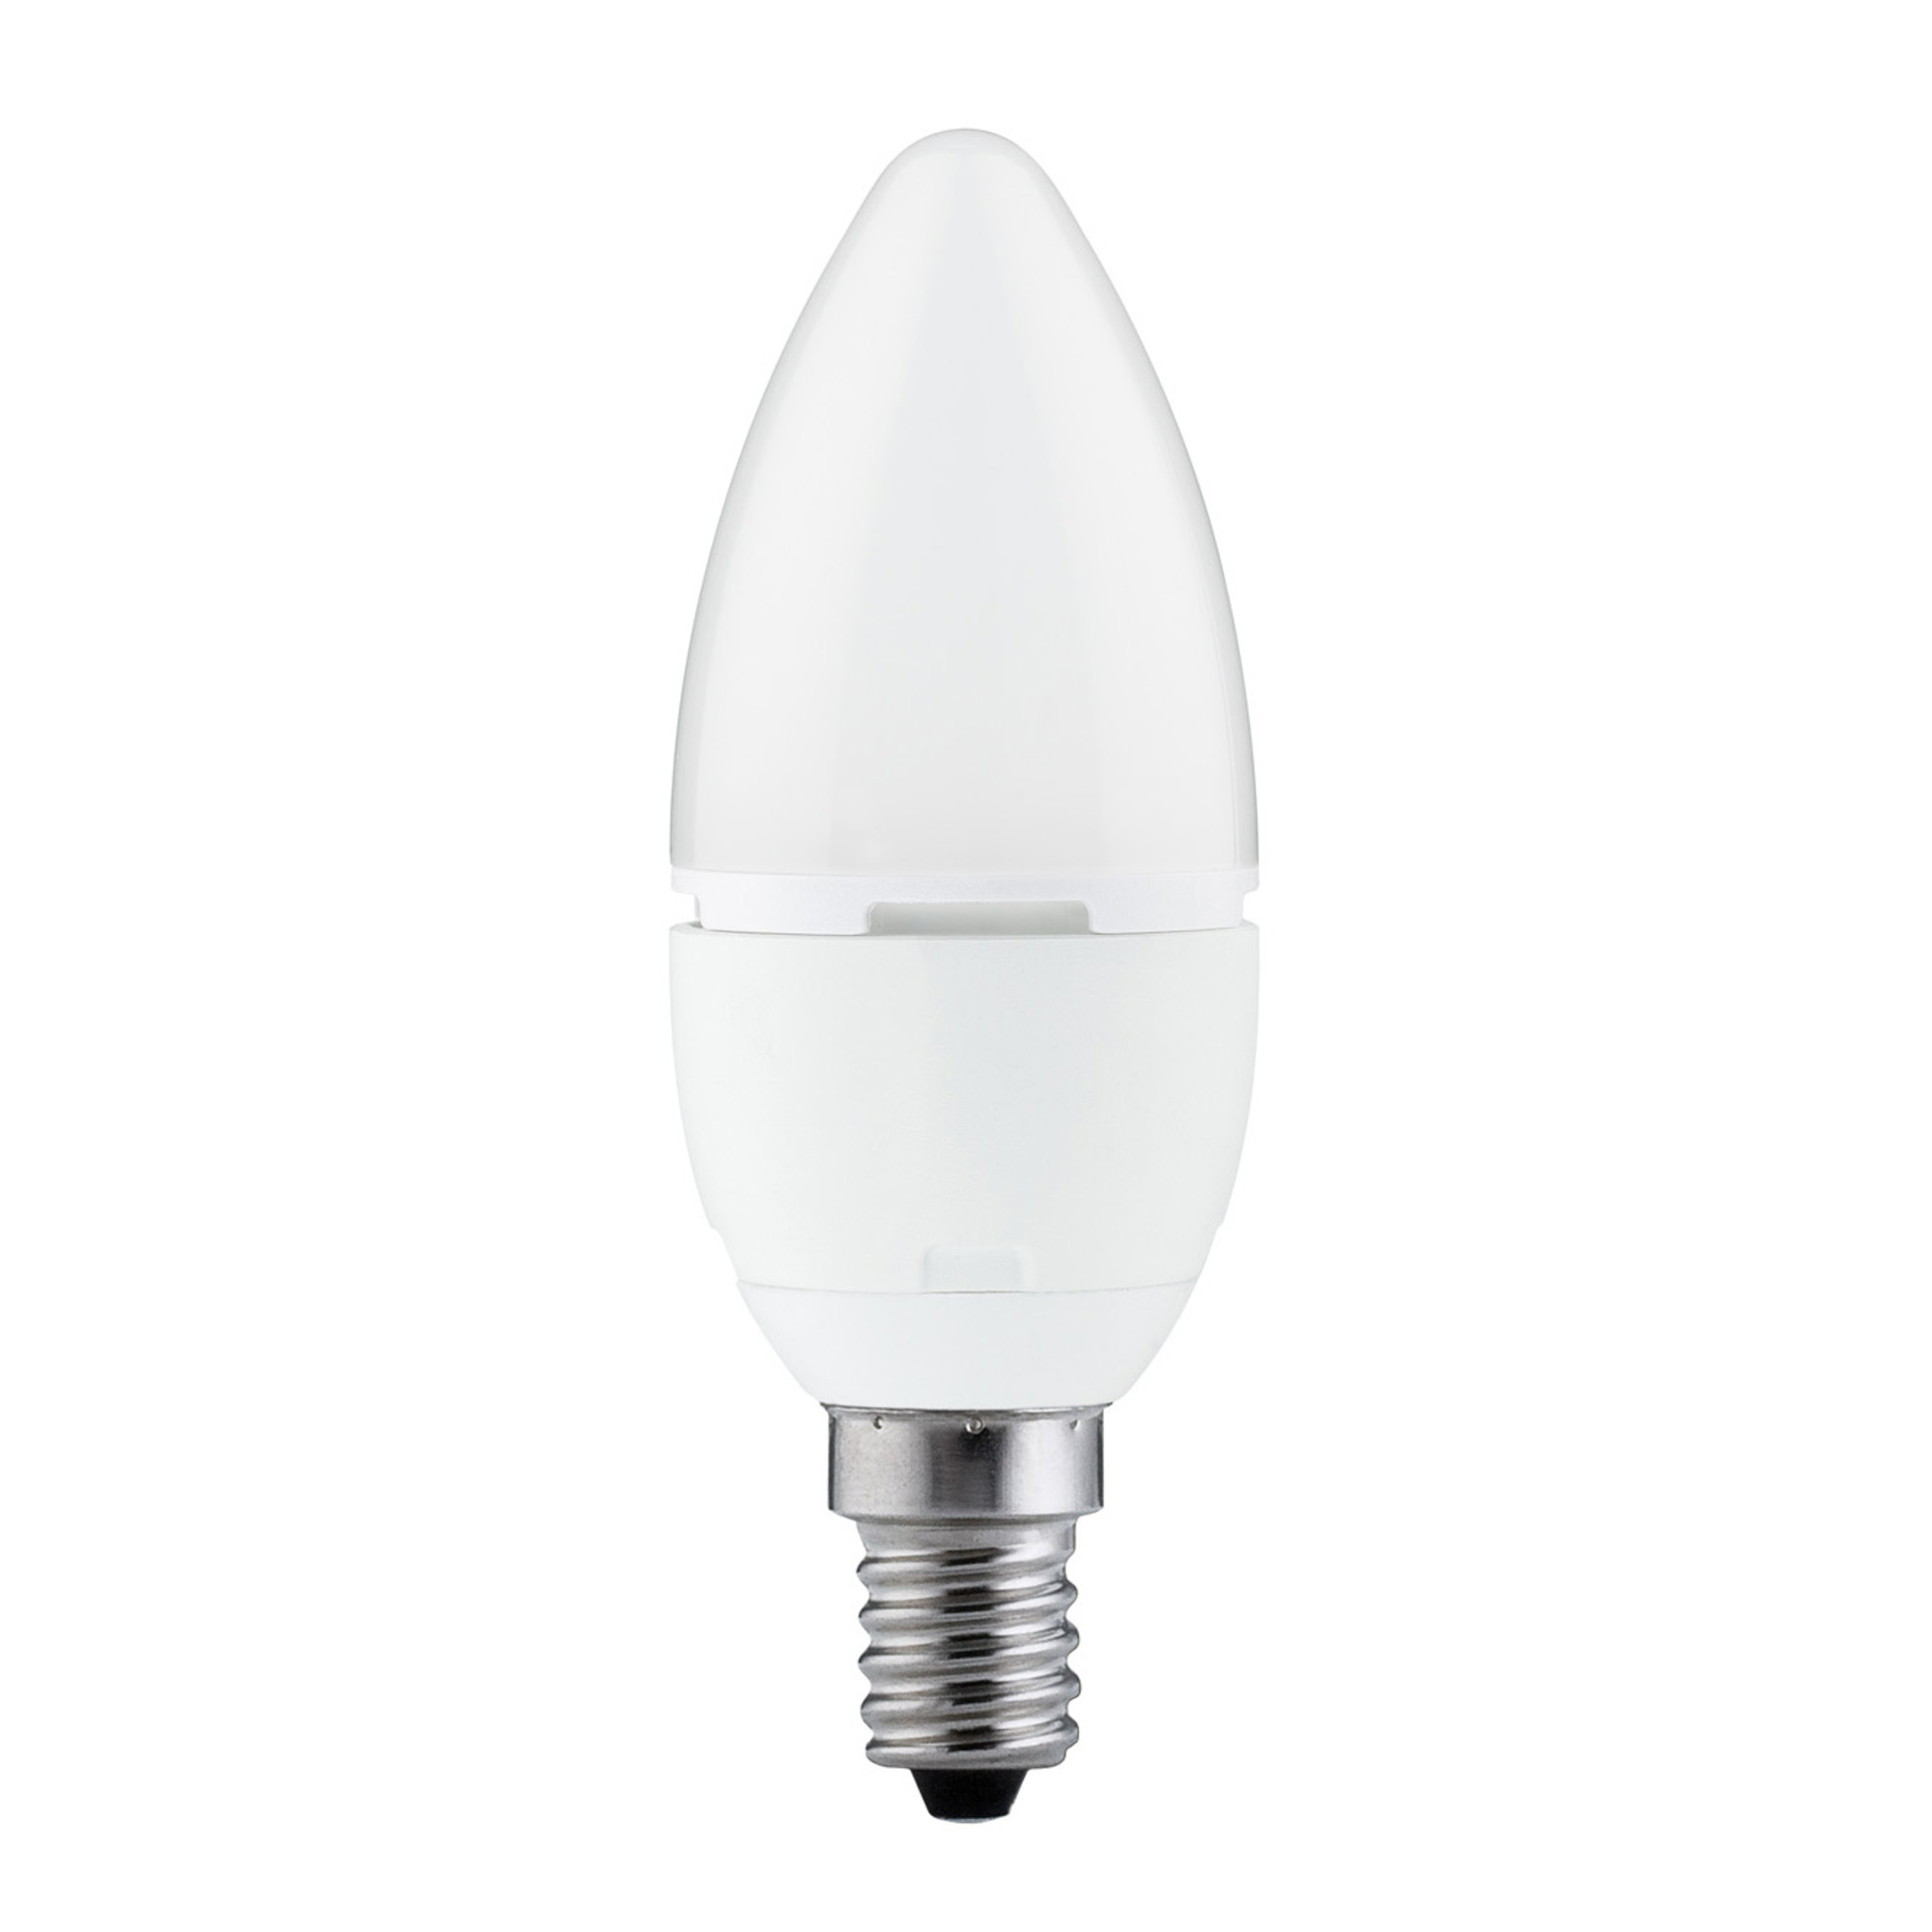 Лампа светодиодная Paulmann 28182 E14 130 Лм теплый свет